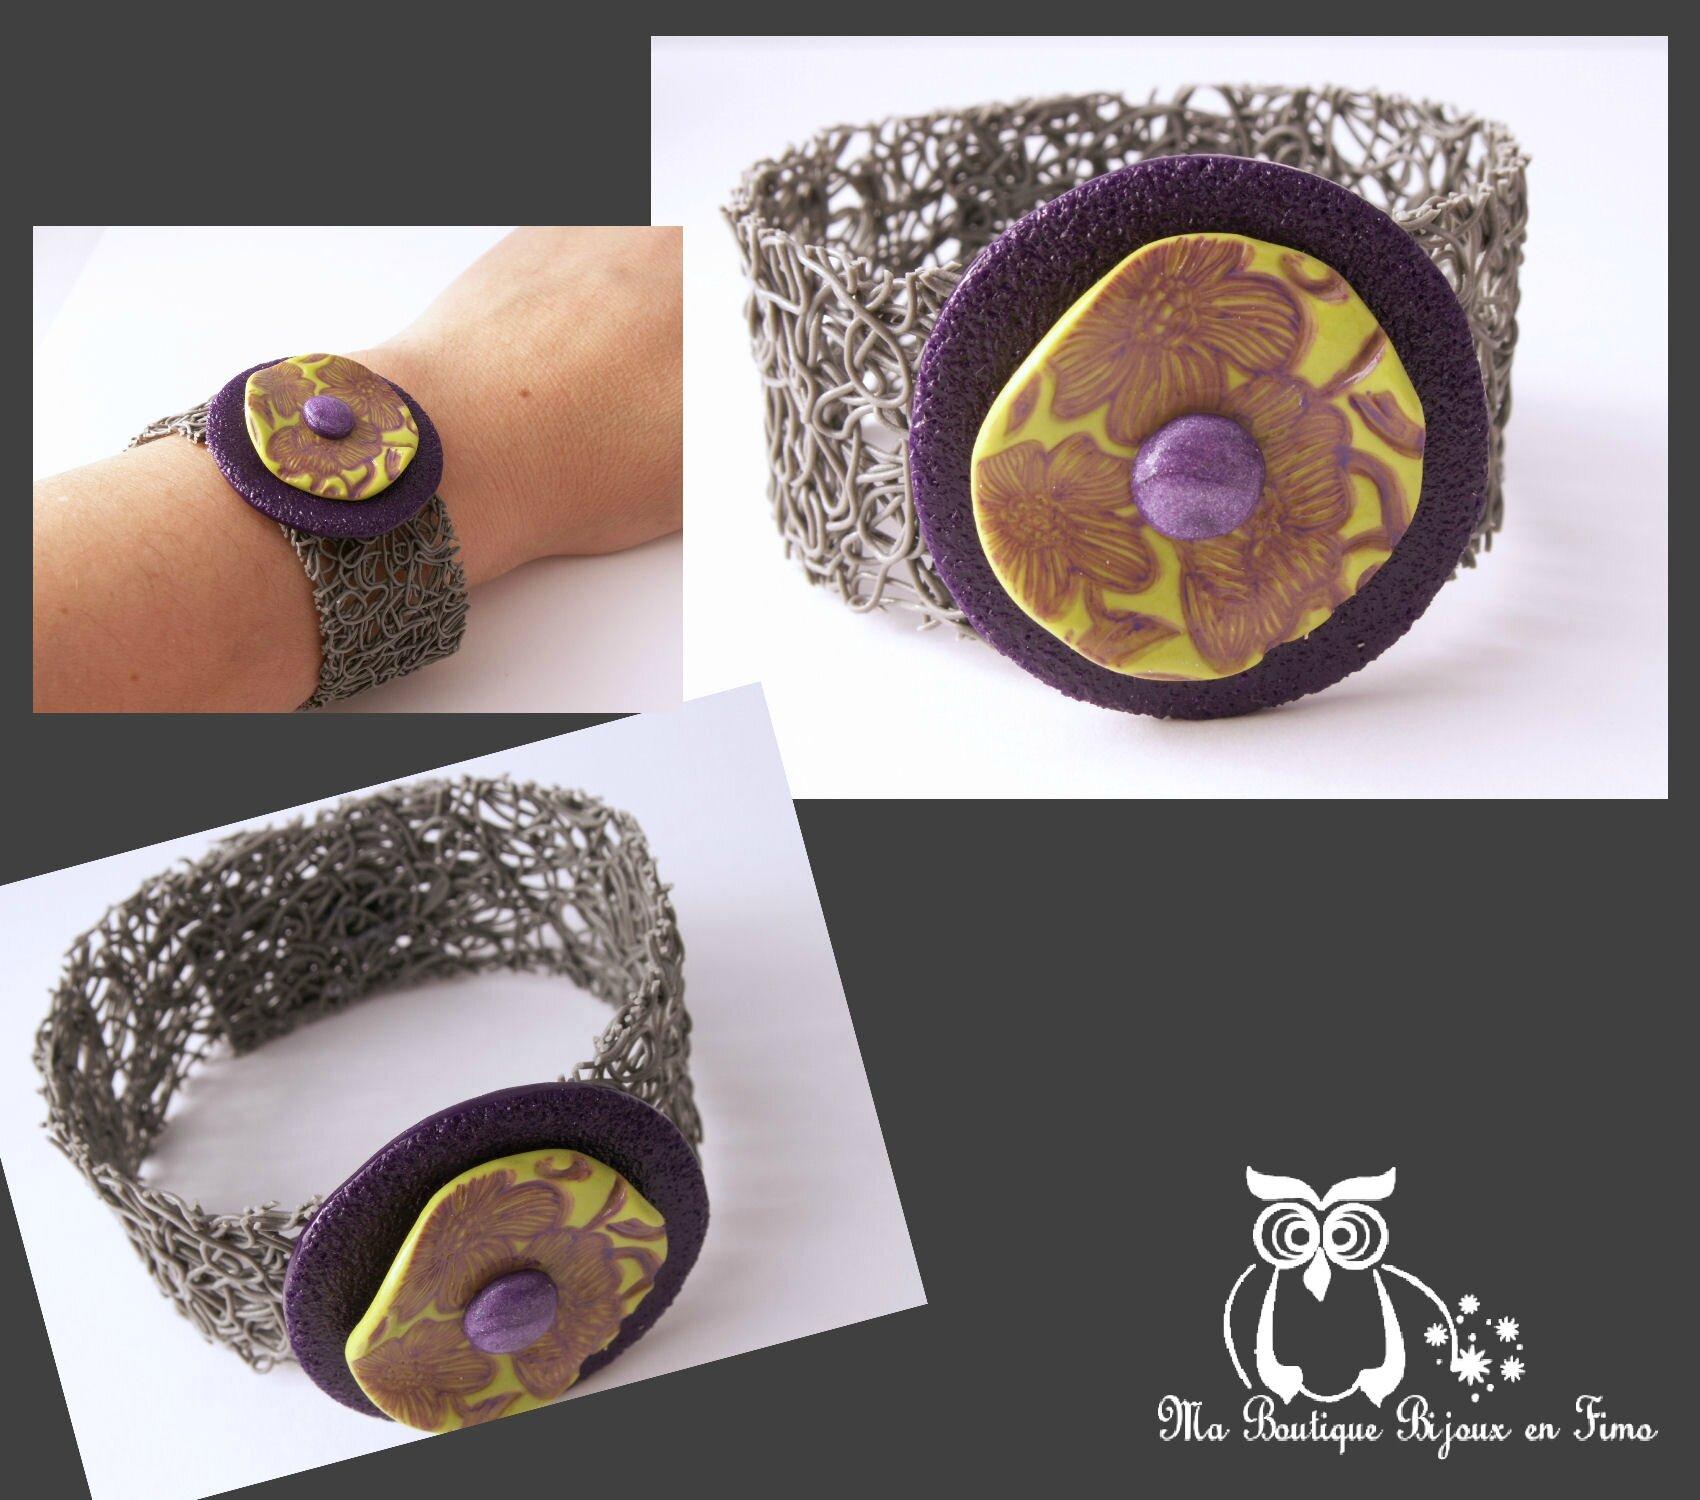 Bracelet corolle violet et tampon fleur